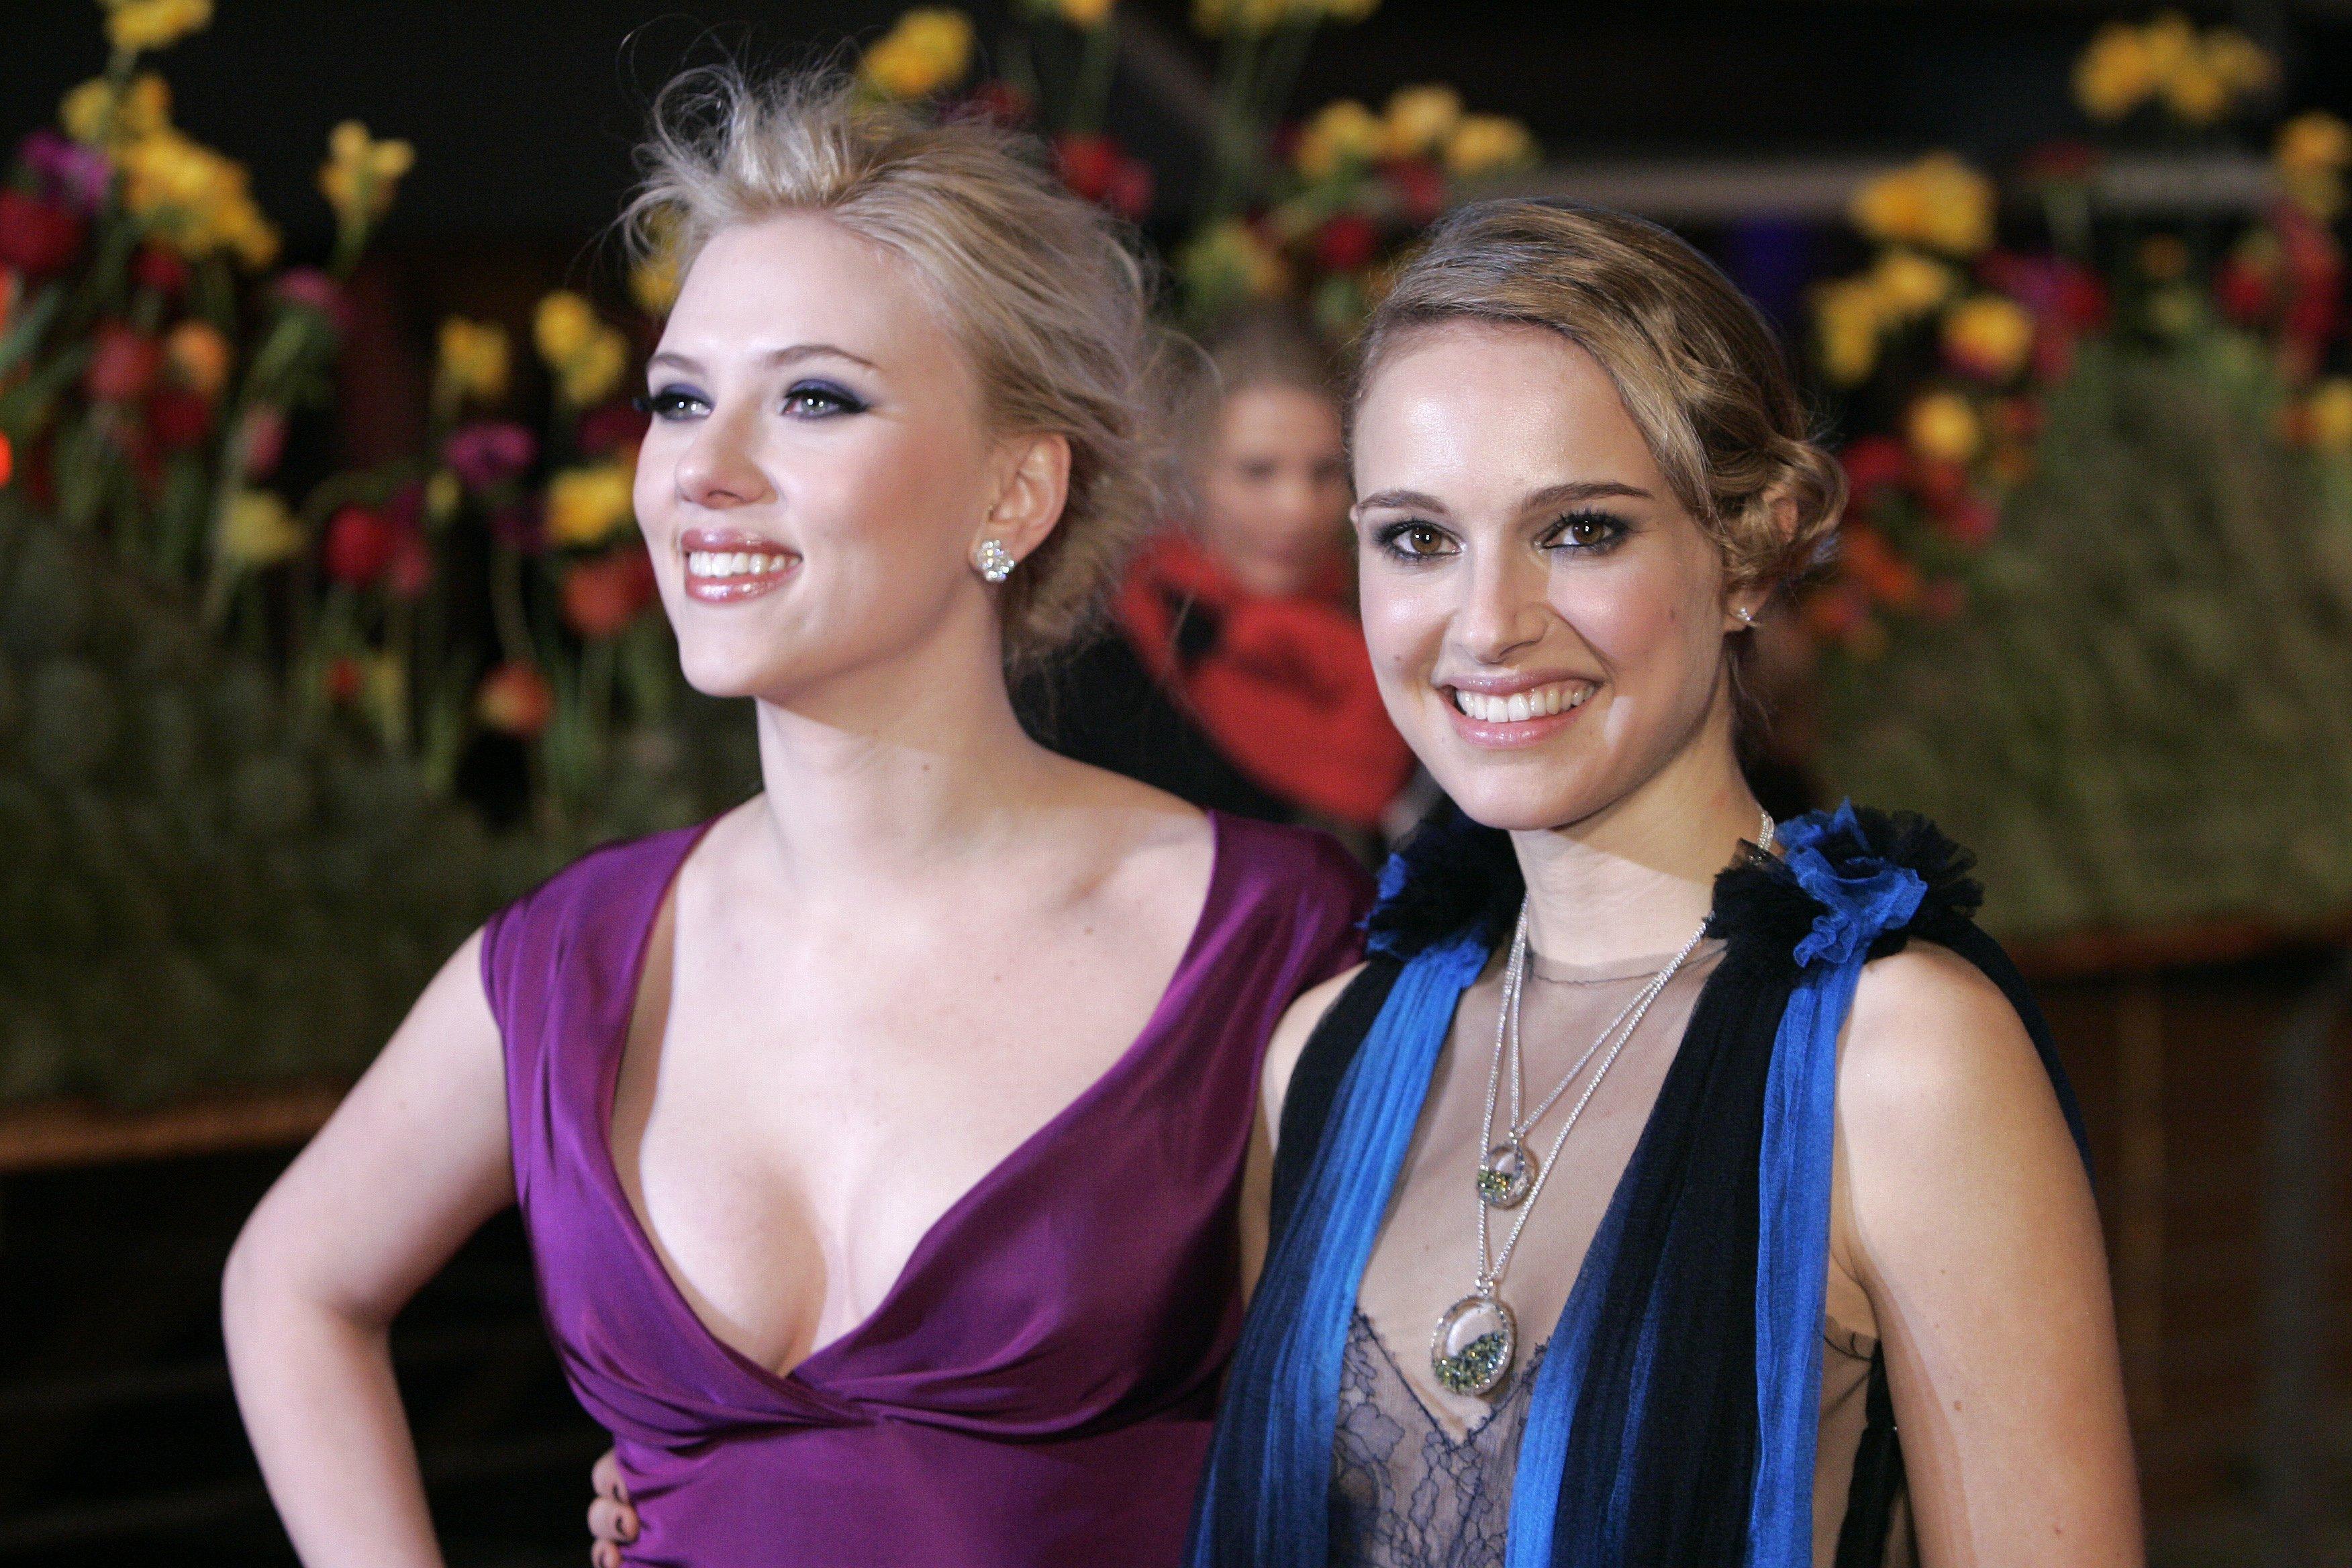 16752_Scarlett_Johansson_Natalie_Portman-The_Other_Boleyn_Girl_Premiere_750_122_1179lo.jpg